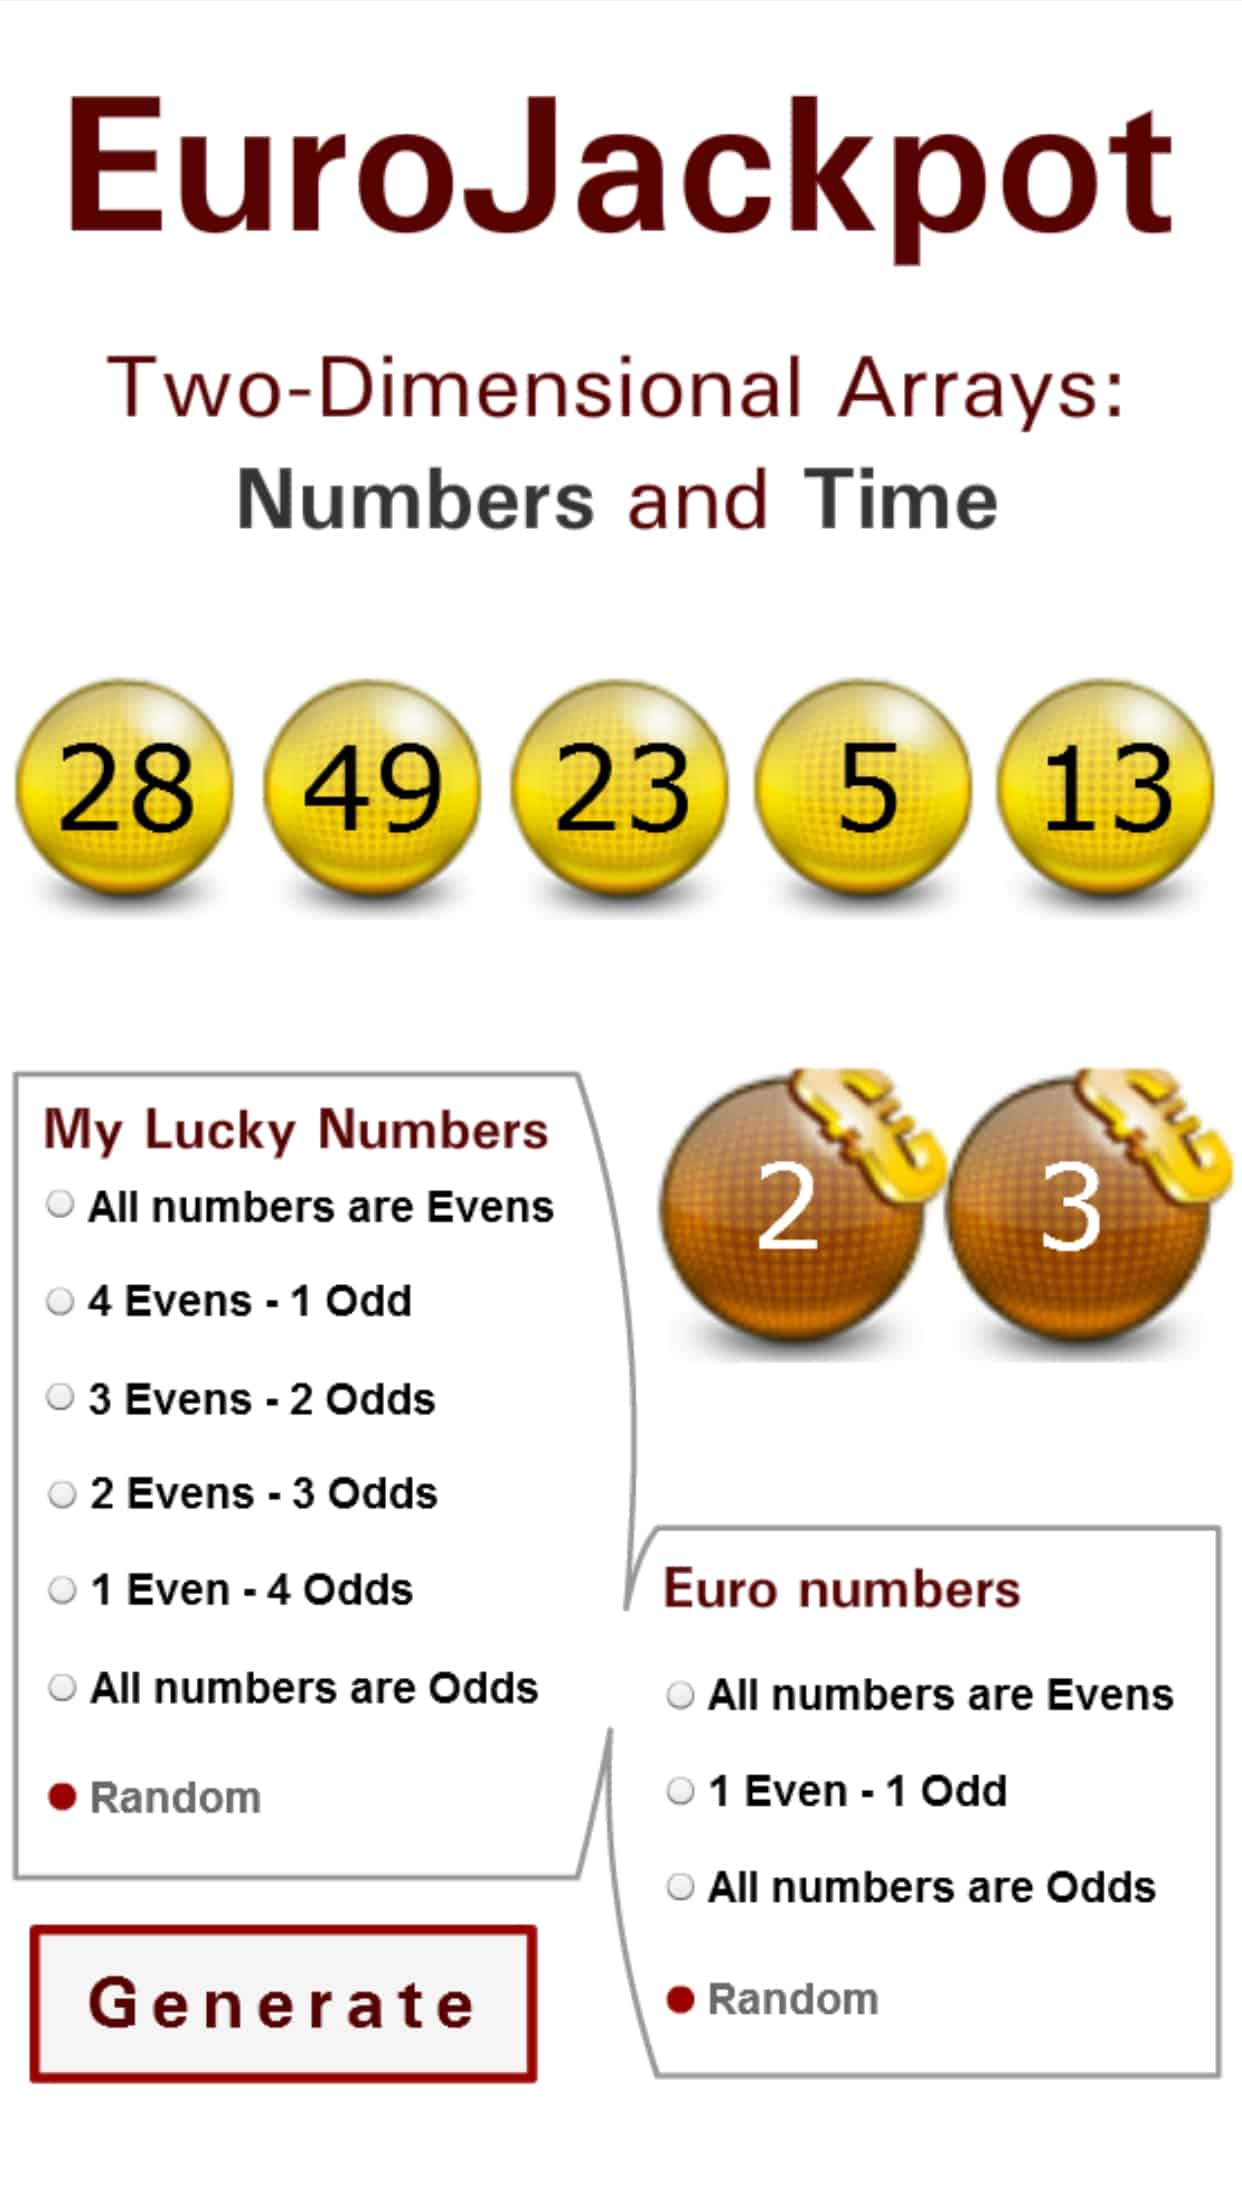 Eurojackpot generator - results and random numbers